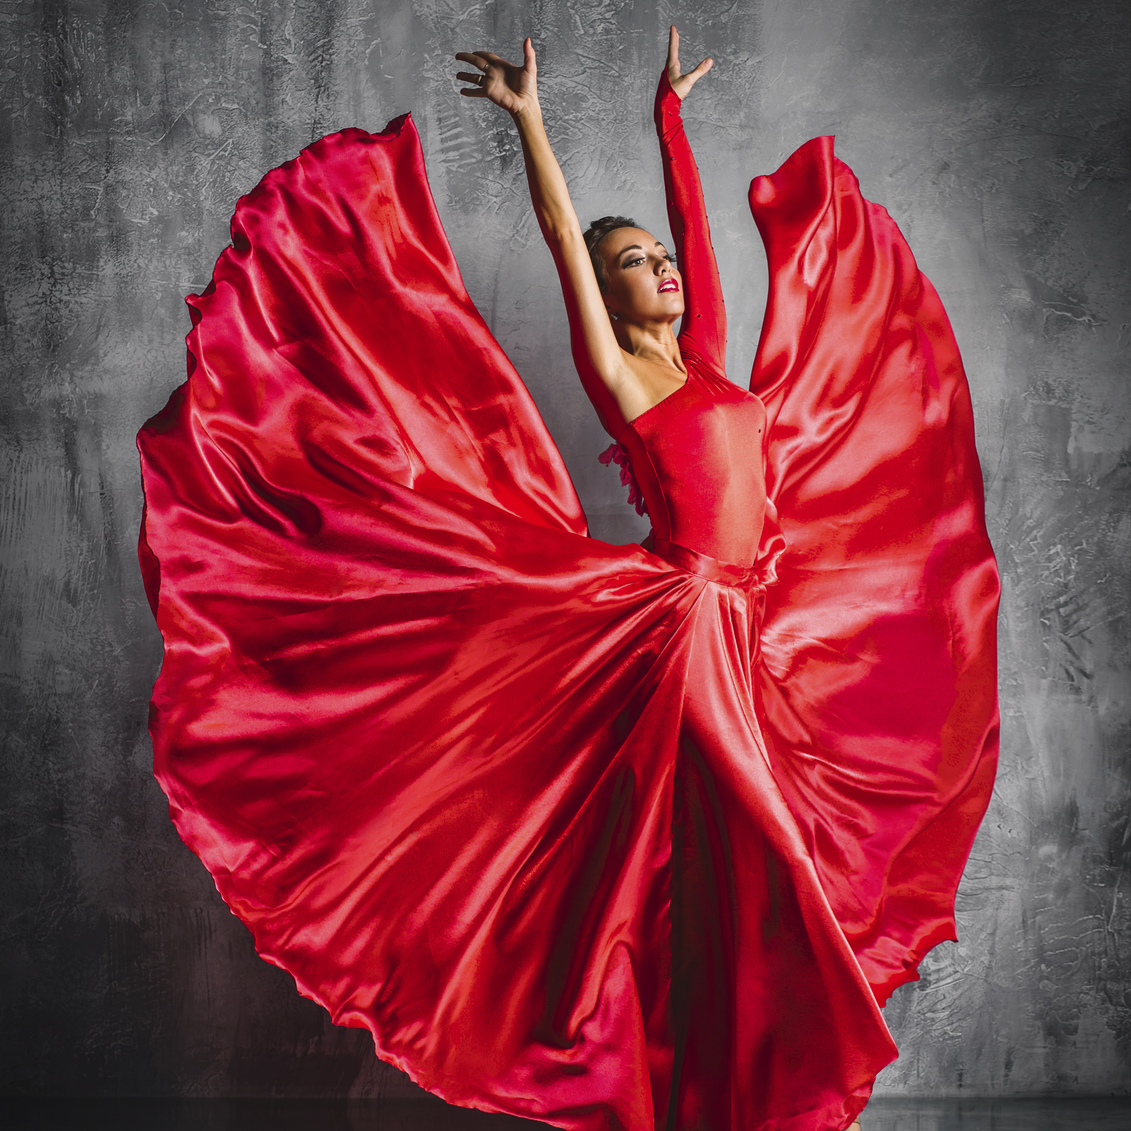 танцовщица фламенко картинки это юбилейный